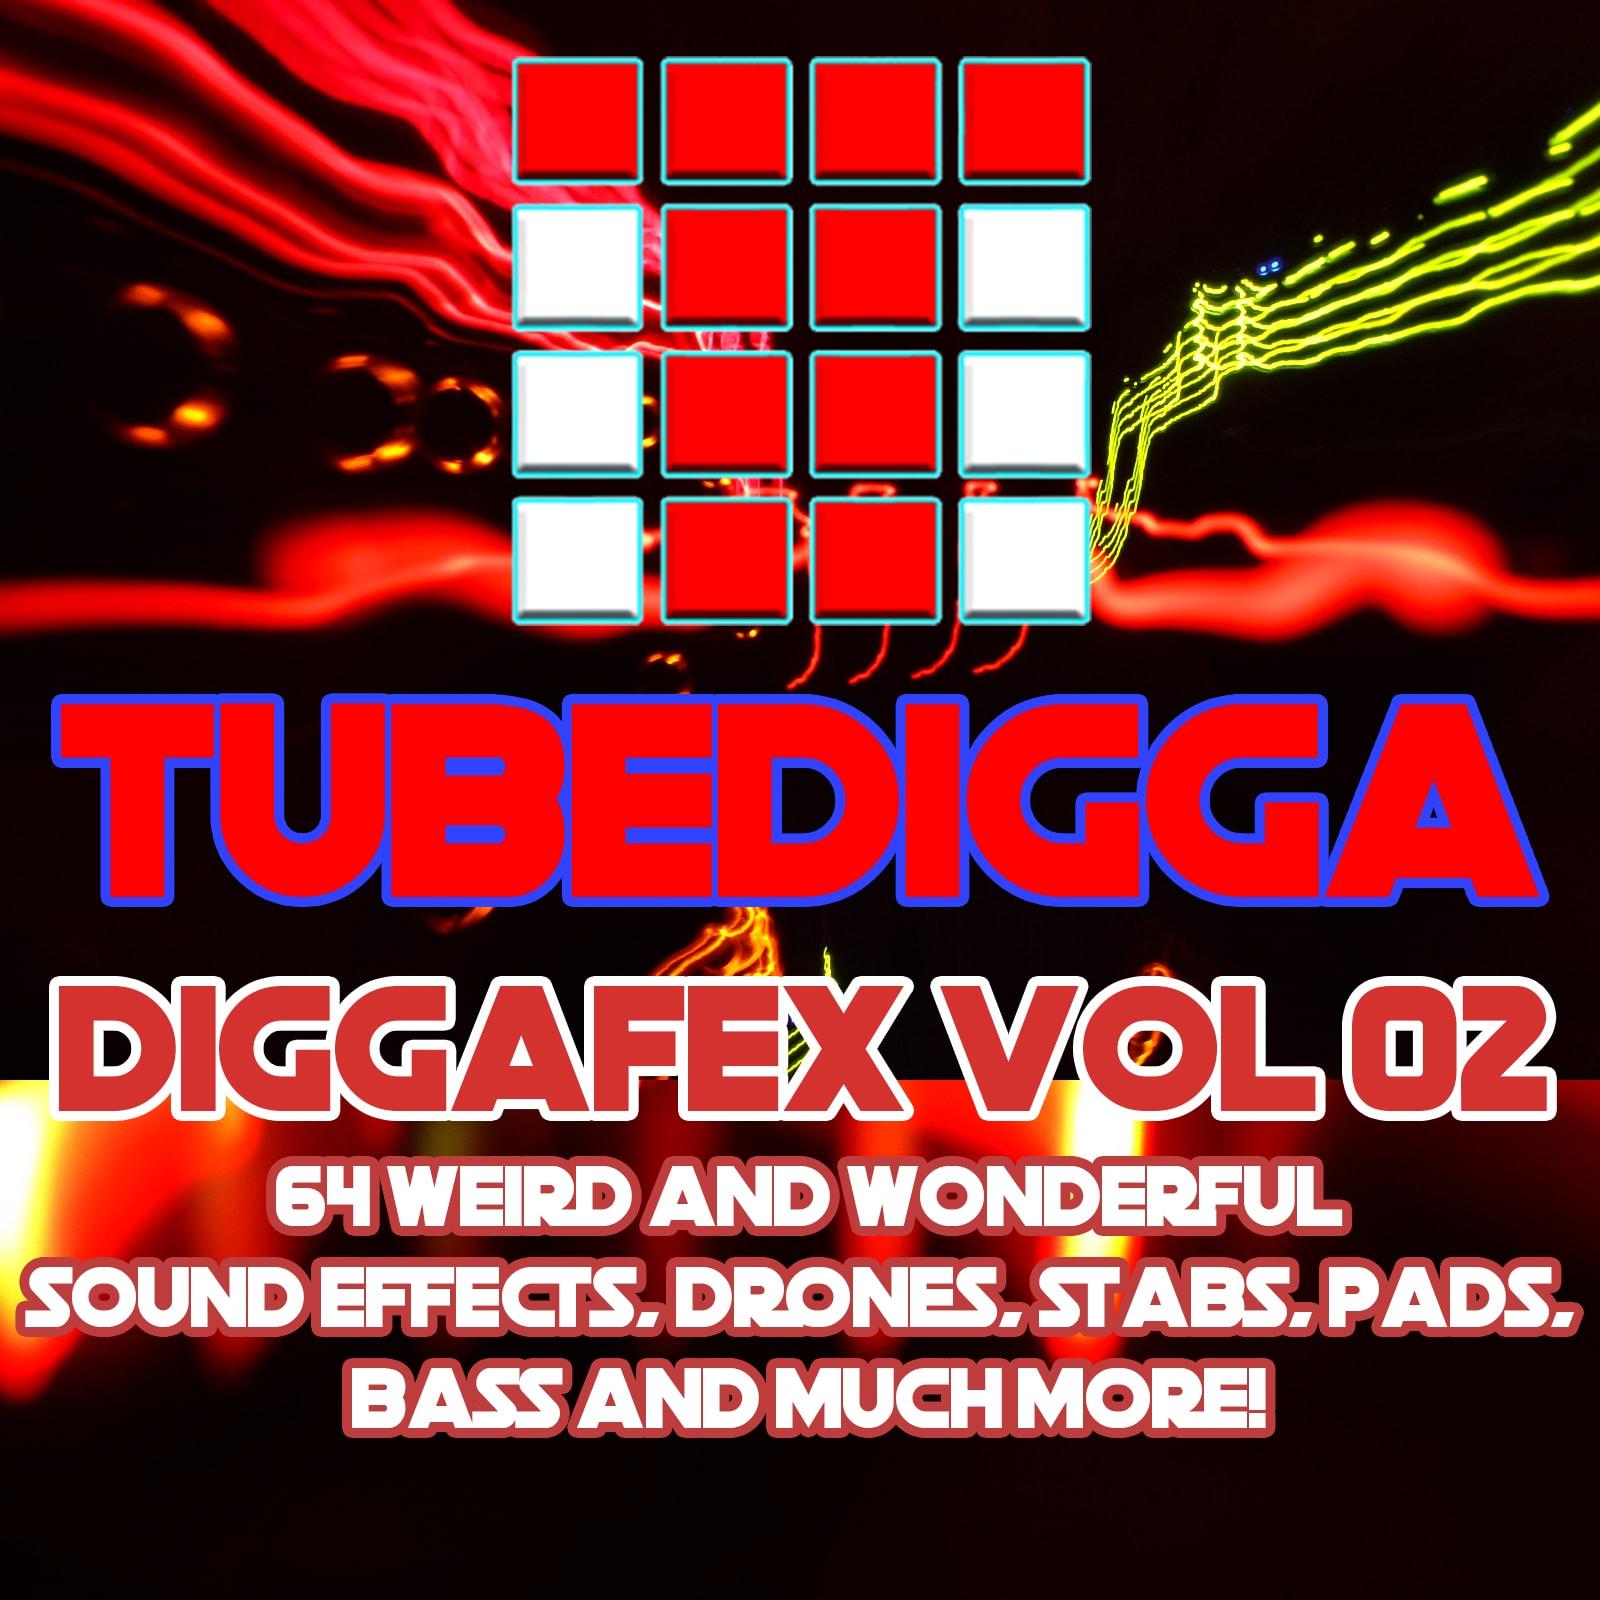 TUBEDIGGA DIGGAFEX VOL 02